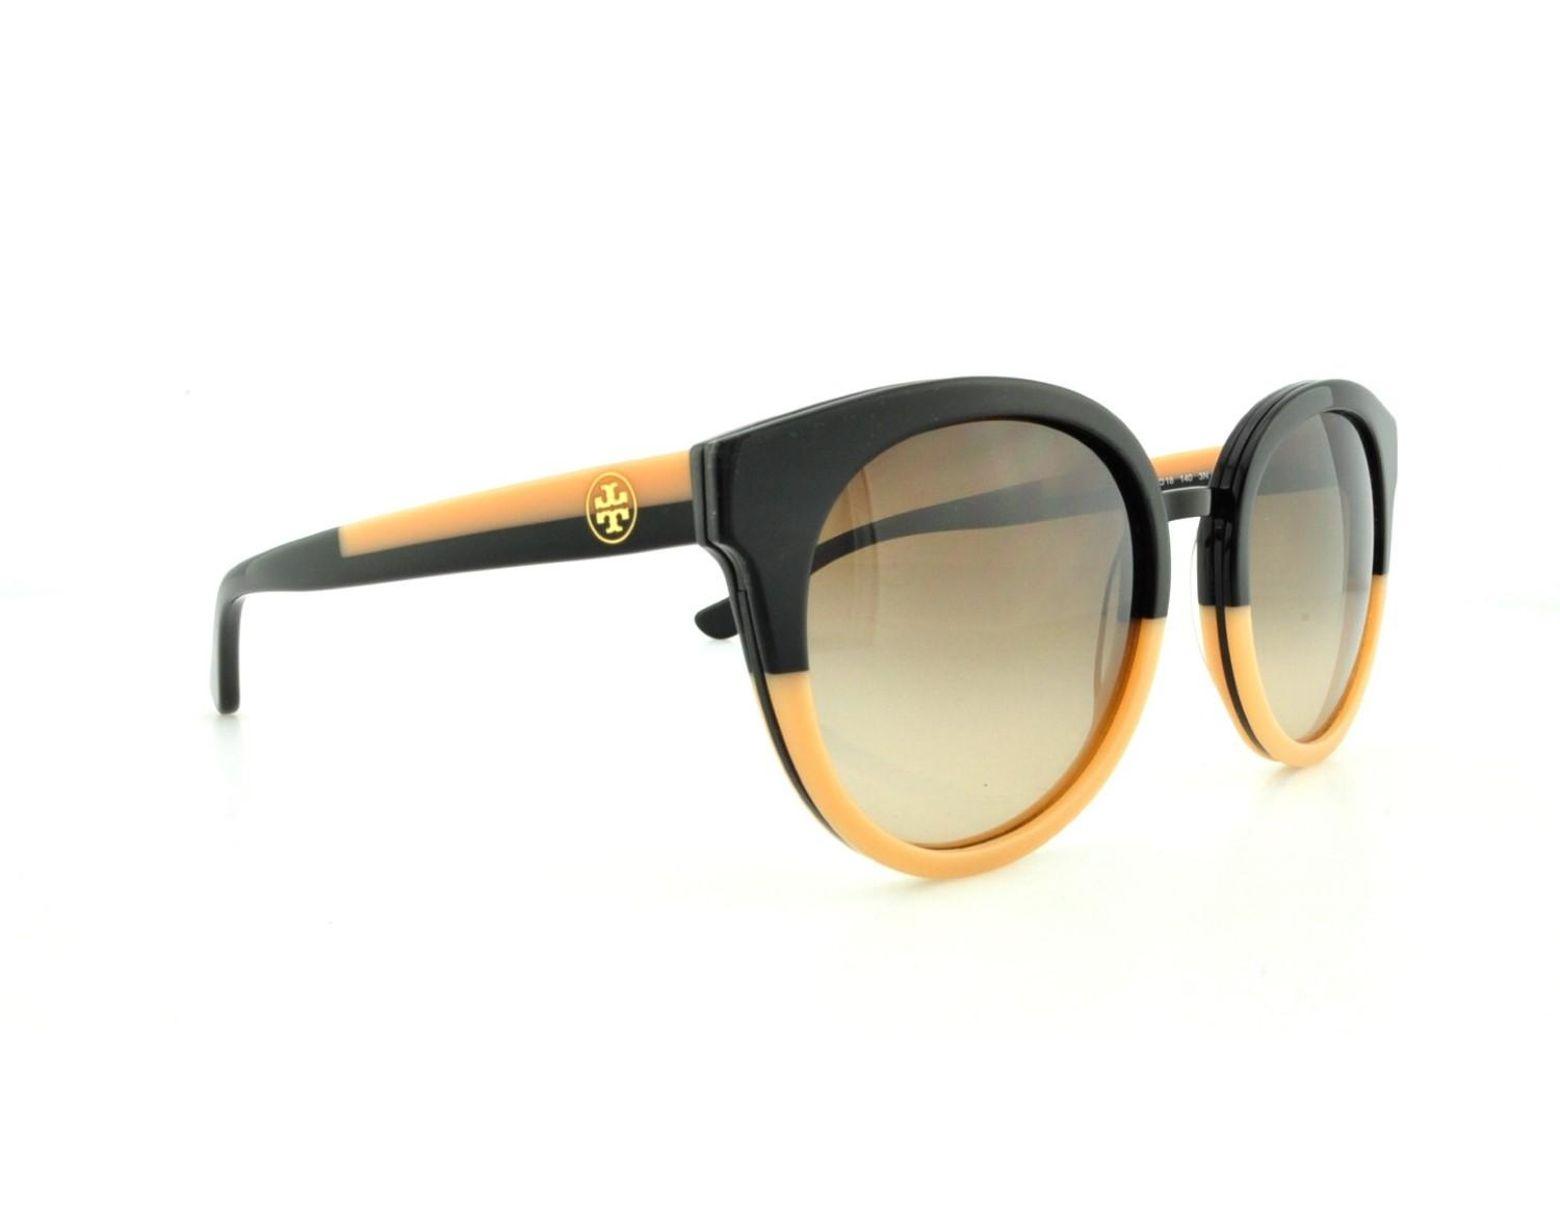 ec8781f7620d Tory Burch Panama Ty7062 Sunglasses 123613-53 - -cream Frame, Brown Gradient  in Black - Lyst